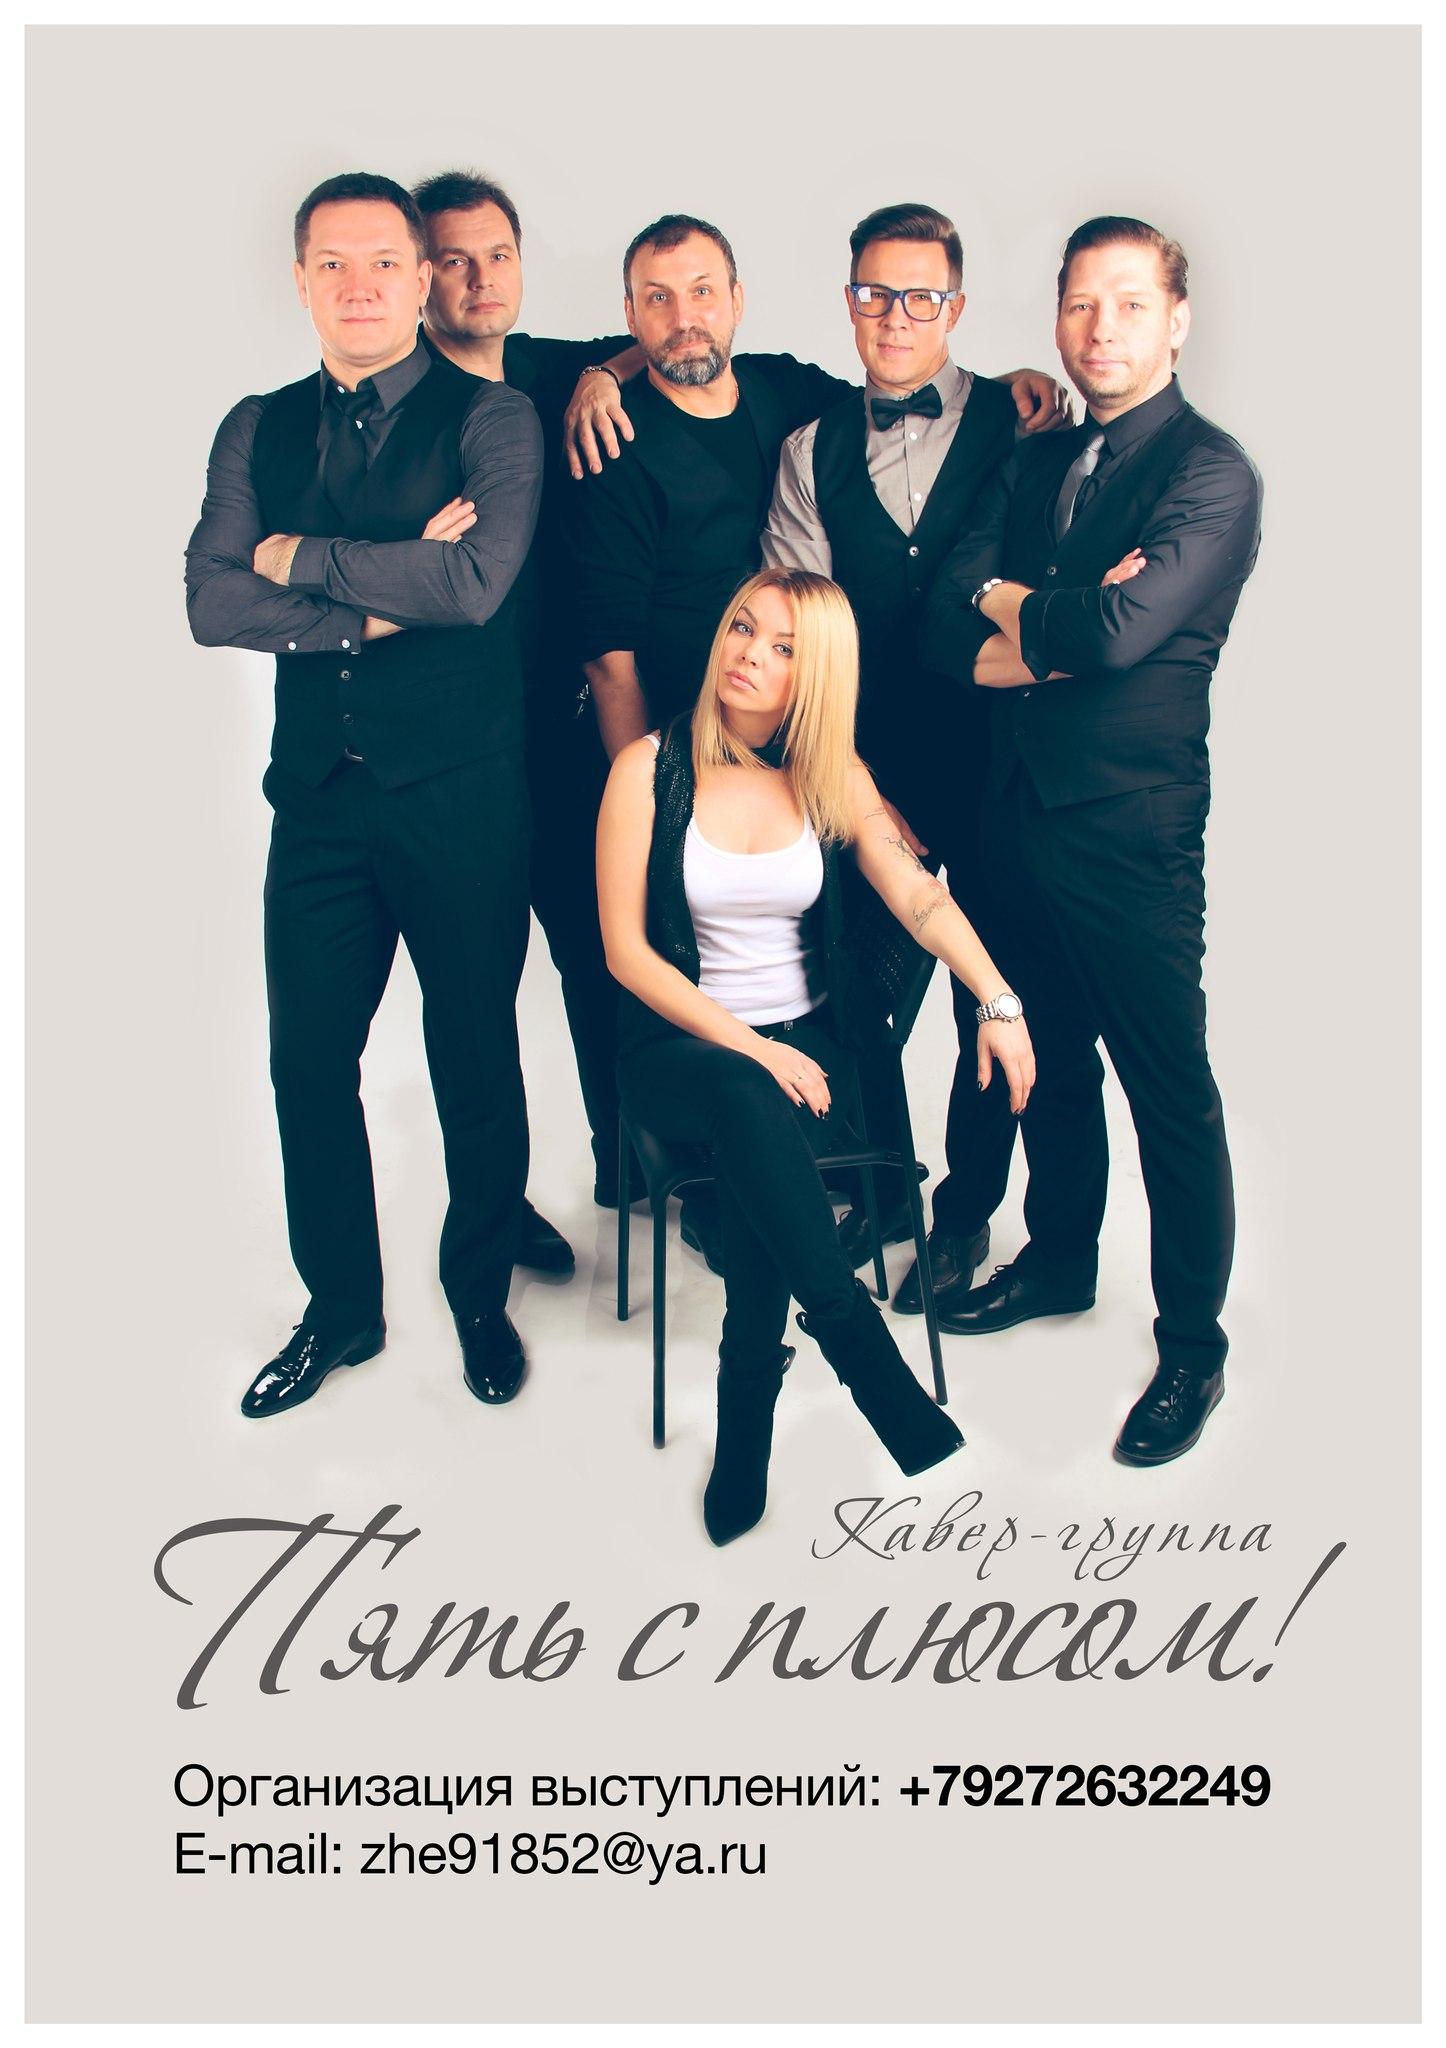 Кавер-группа